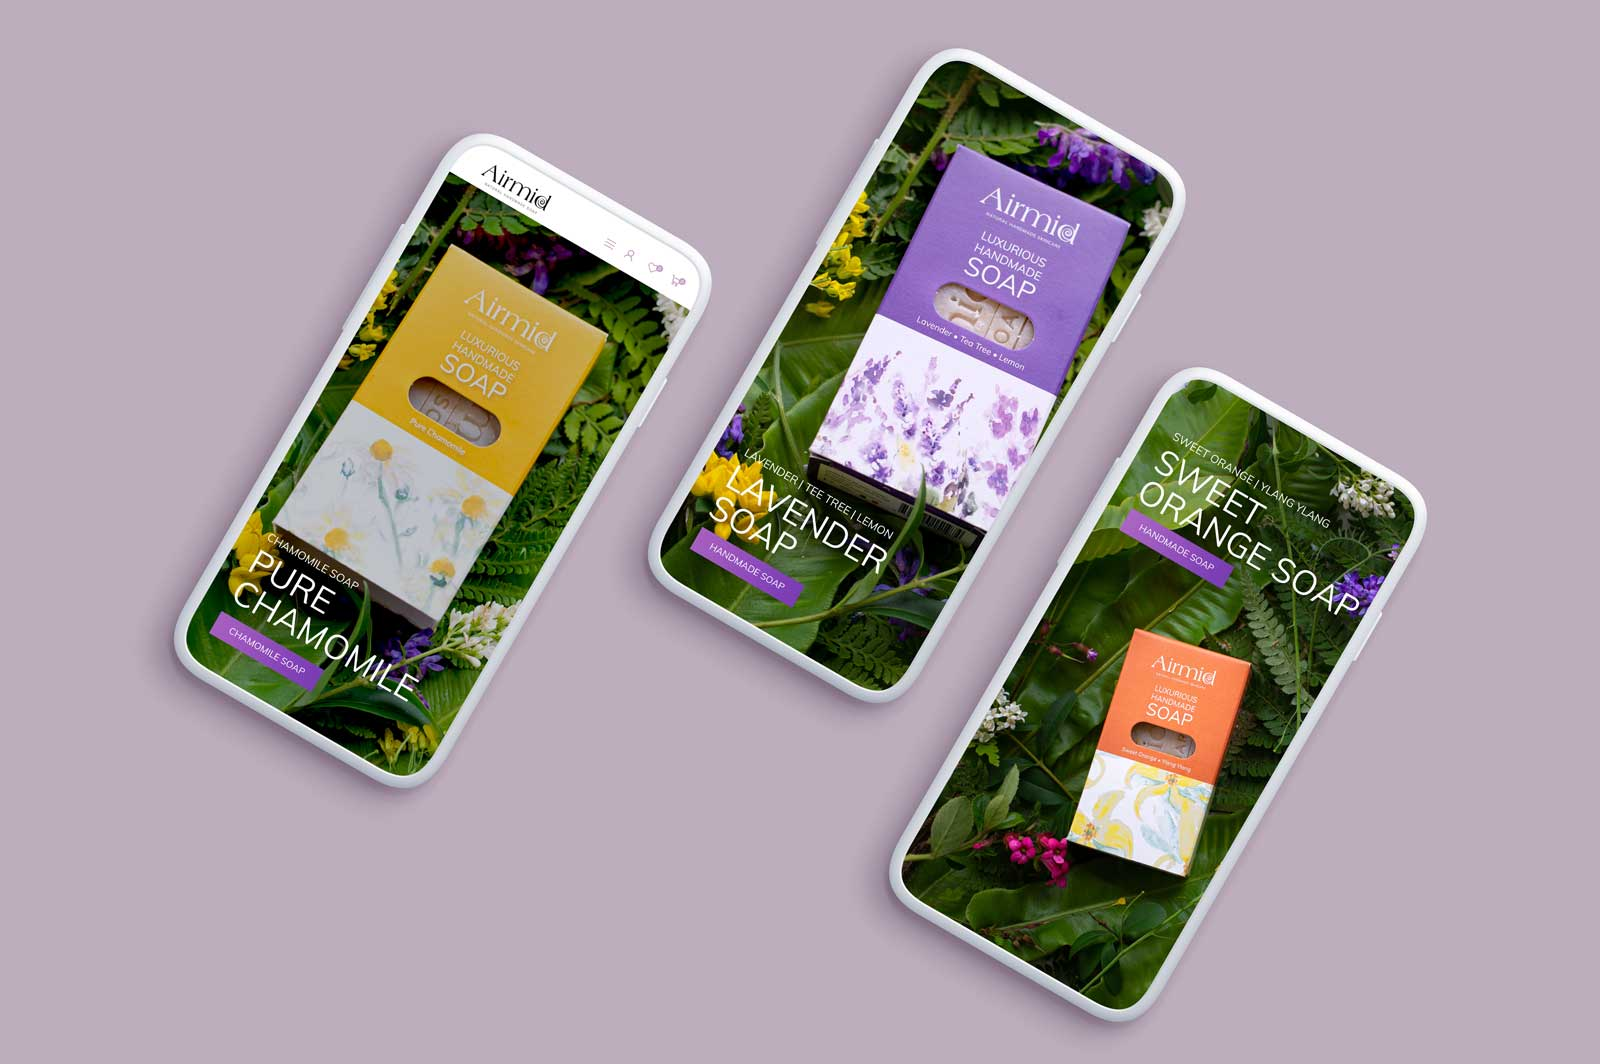 Brand Photography Display On Three Smart Phones